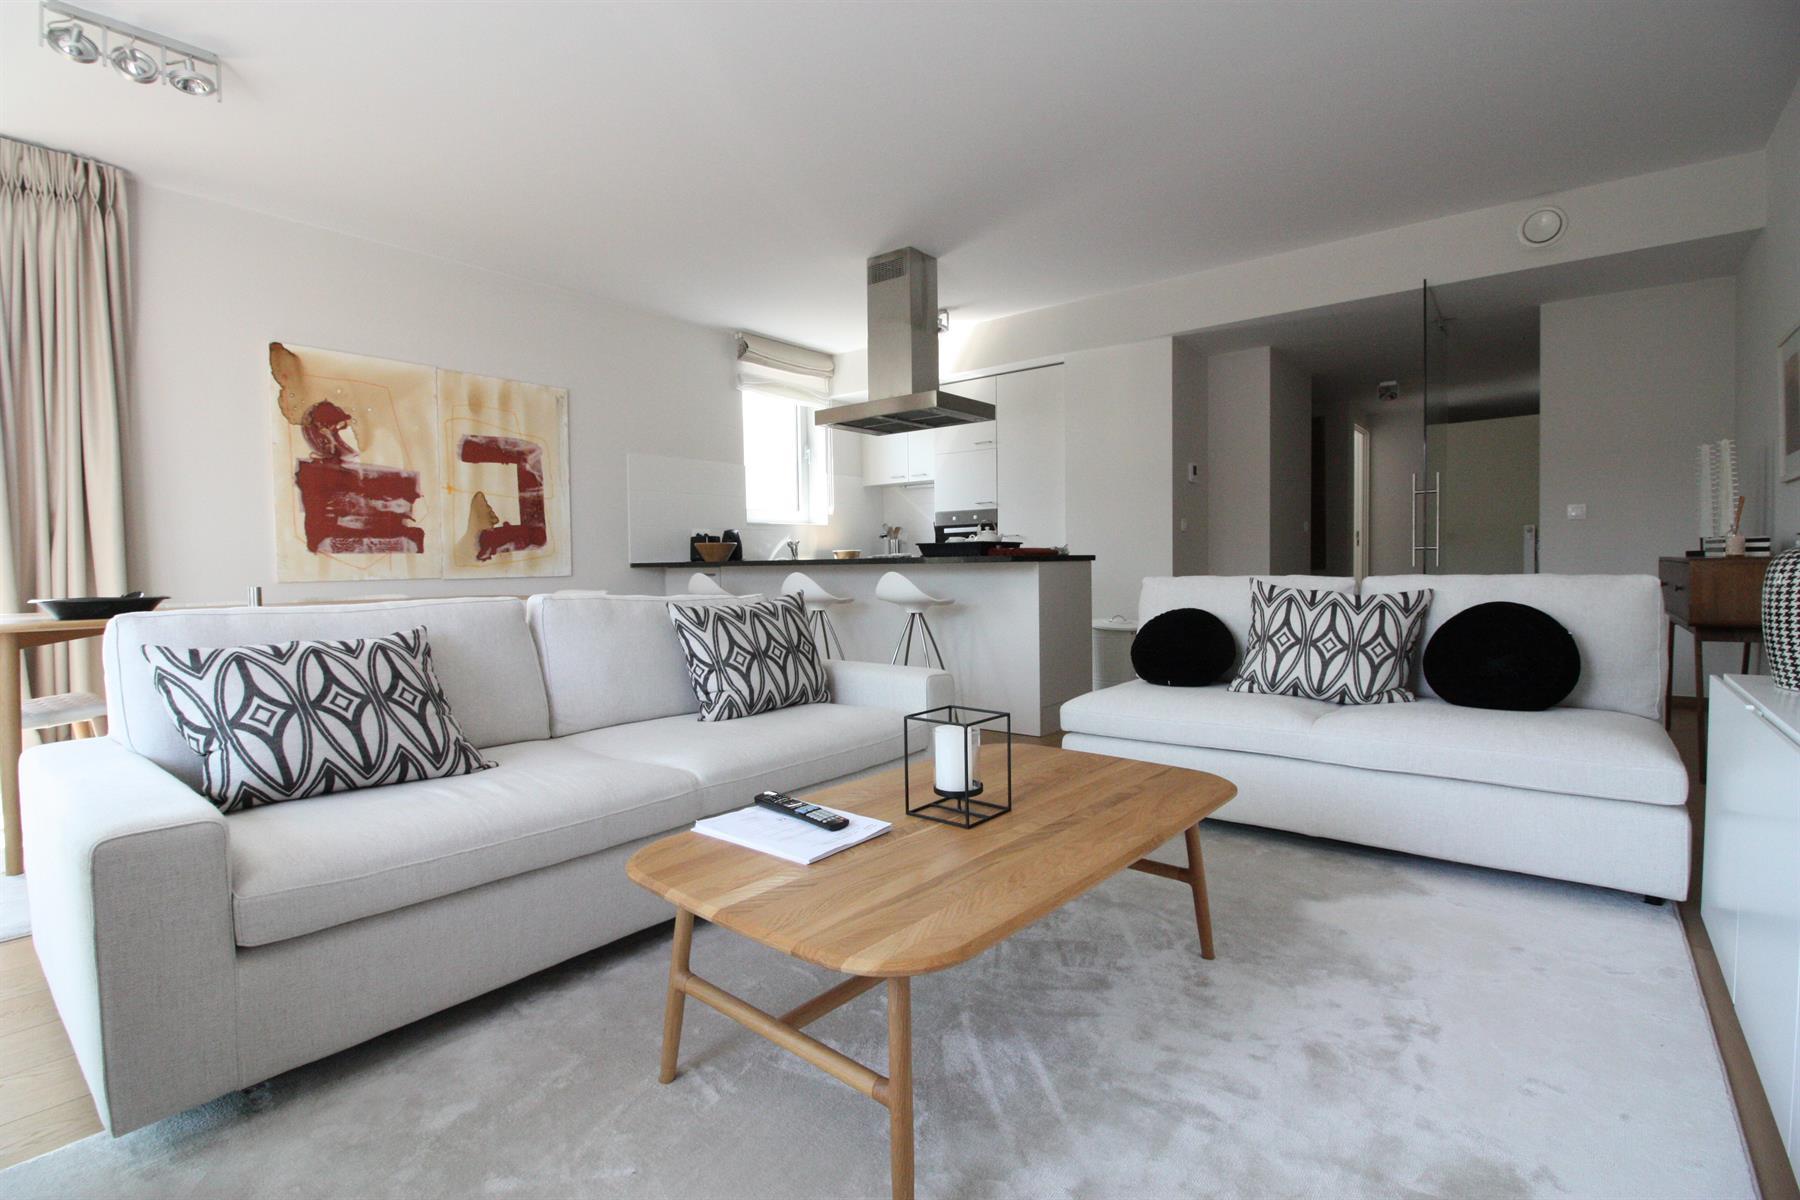 Flat - Etterbeek - #3978340-0